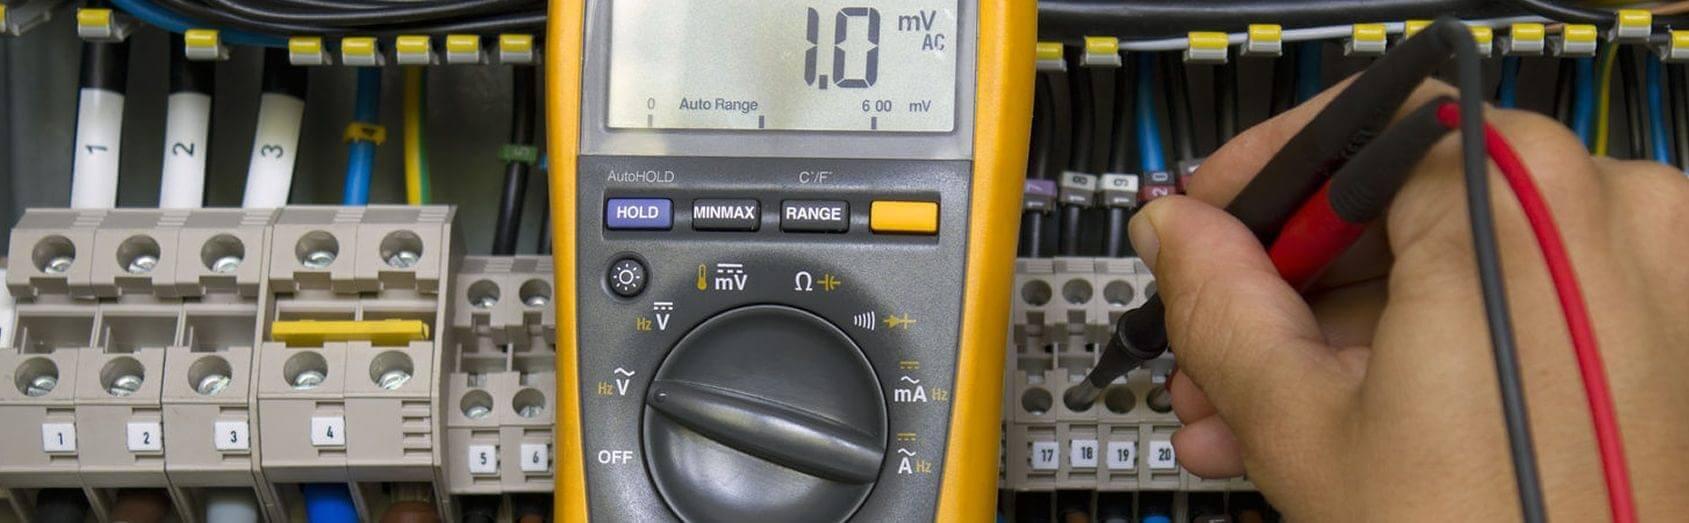 Electrical voltage measuring